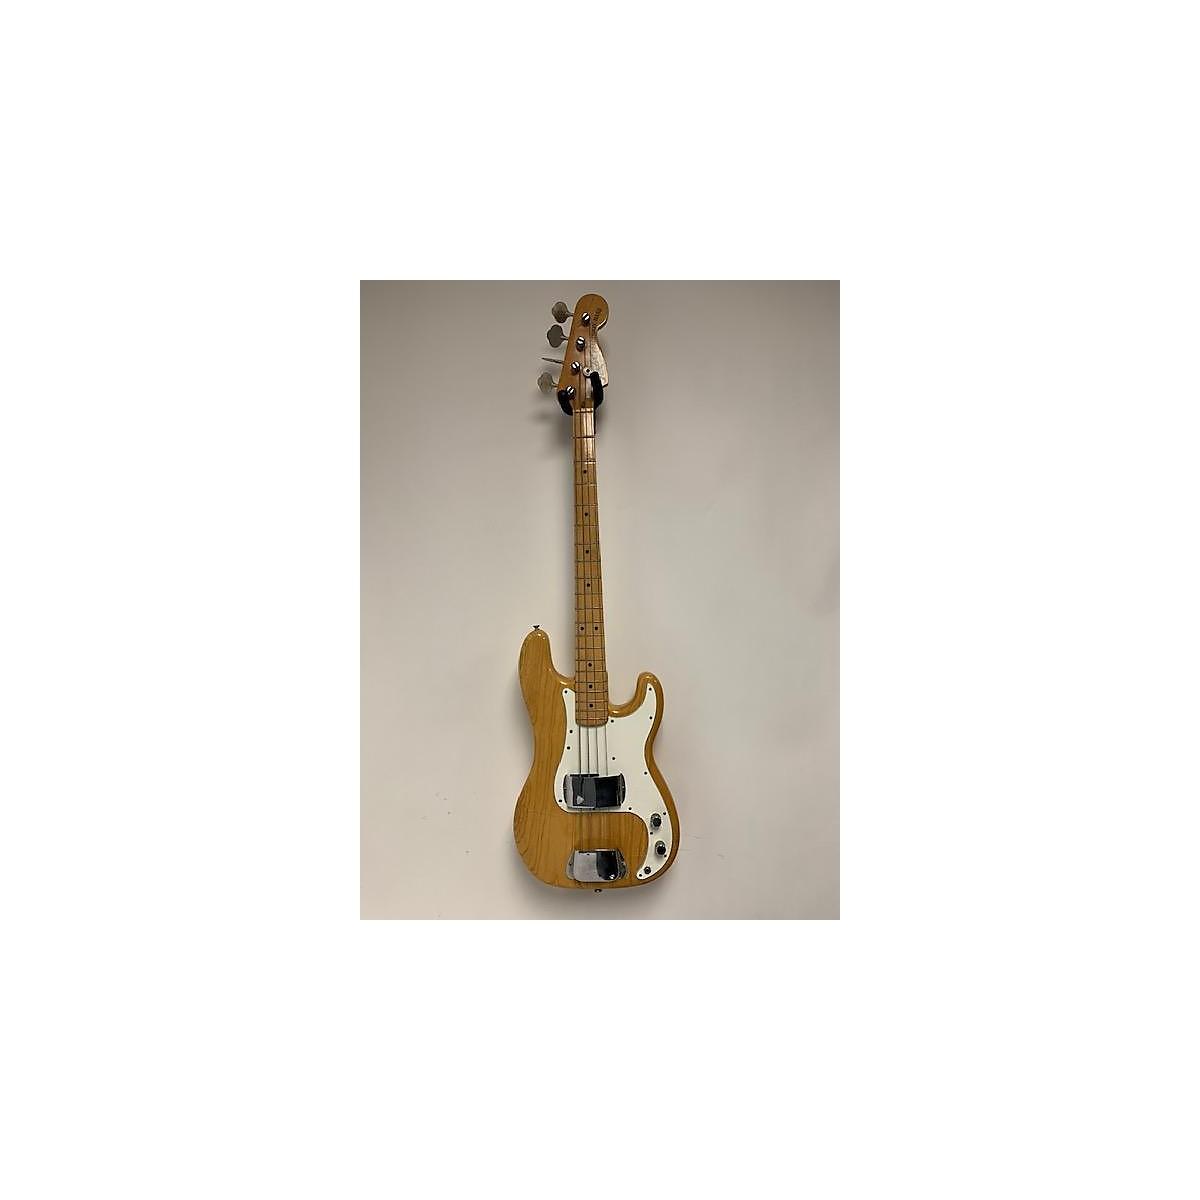 Fender 1974 1974 Fender Precision Bass Natural Electric Bass Guitar